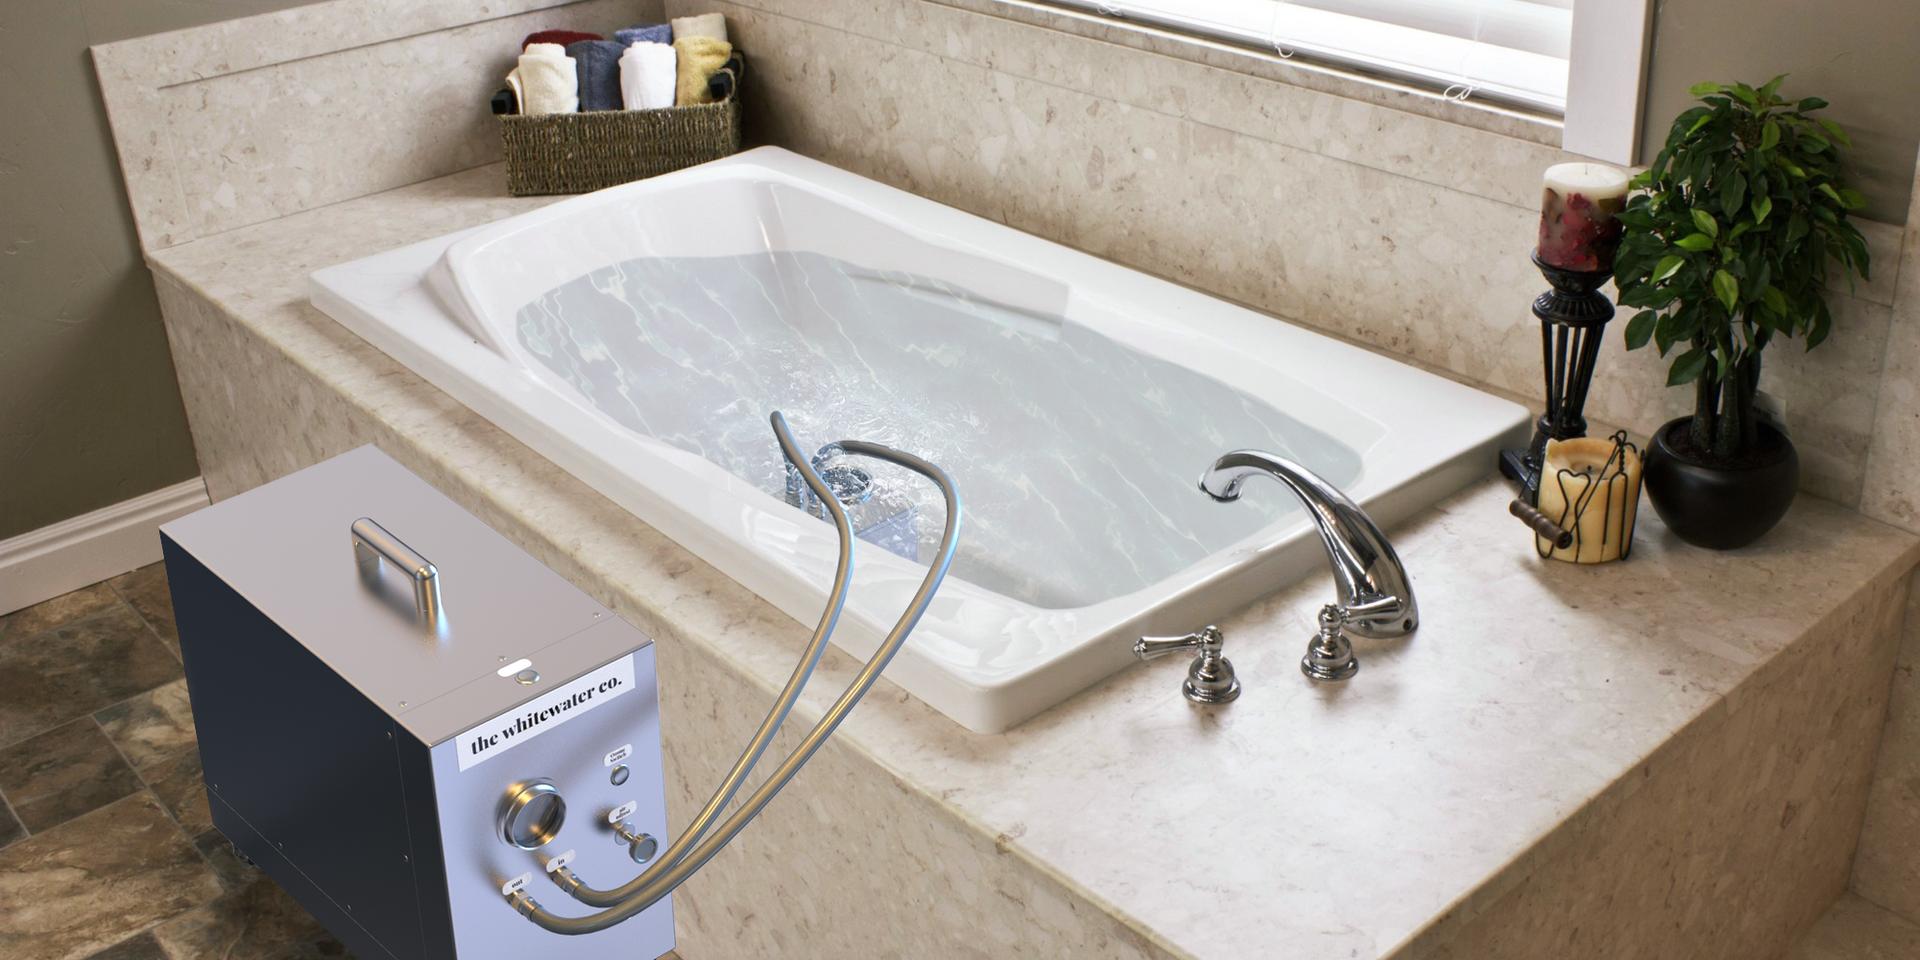 Portable Nanobubble Hydrotherapy in Bathroom